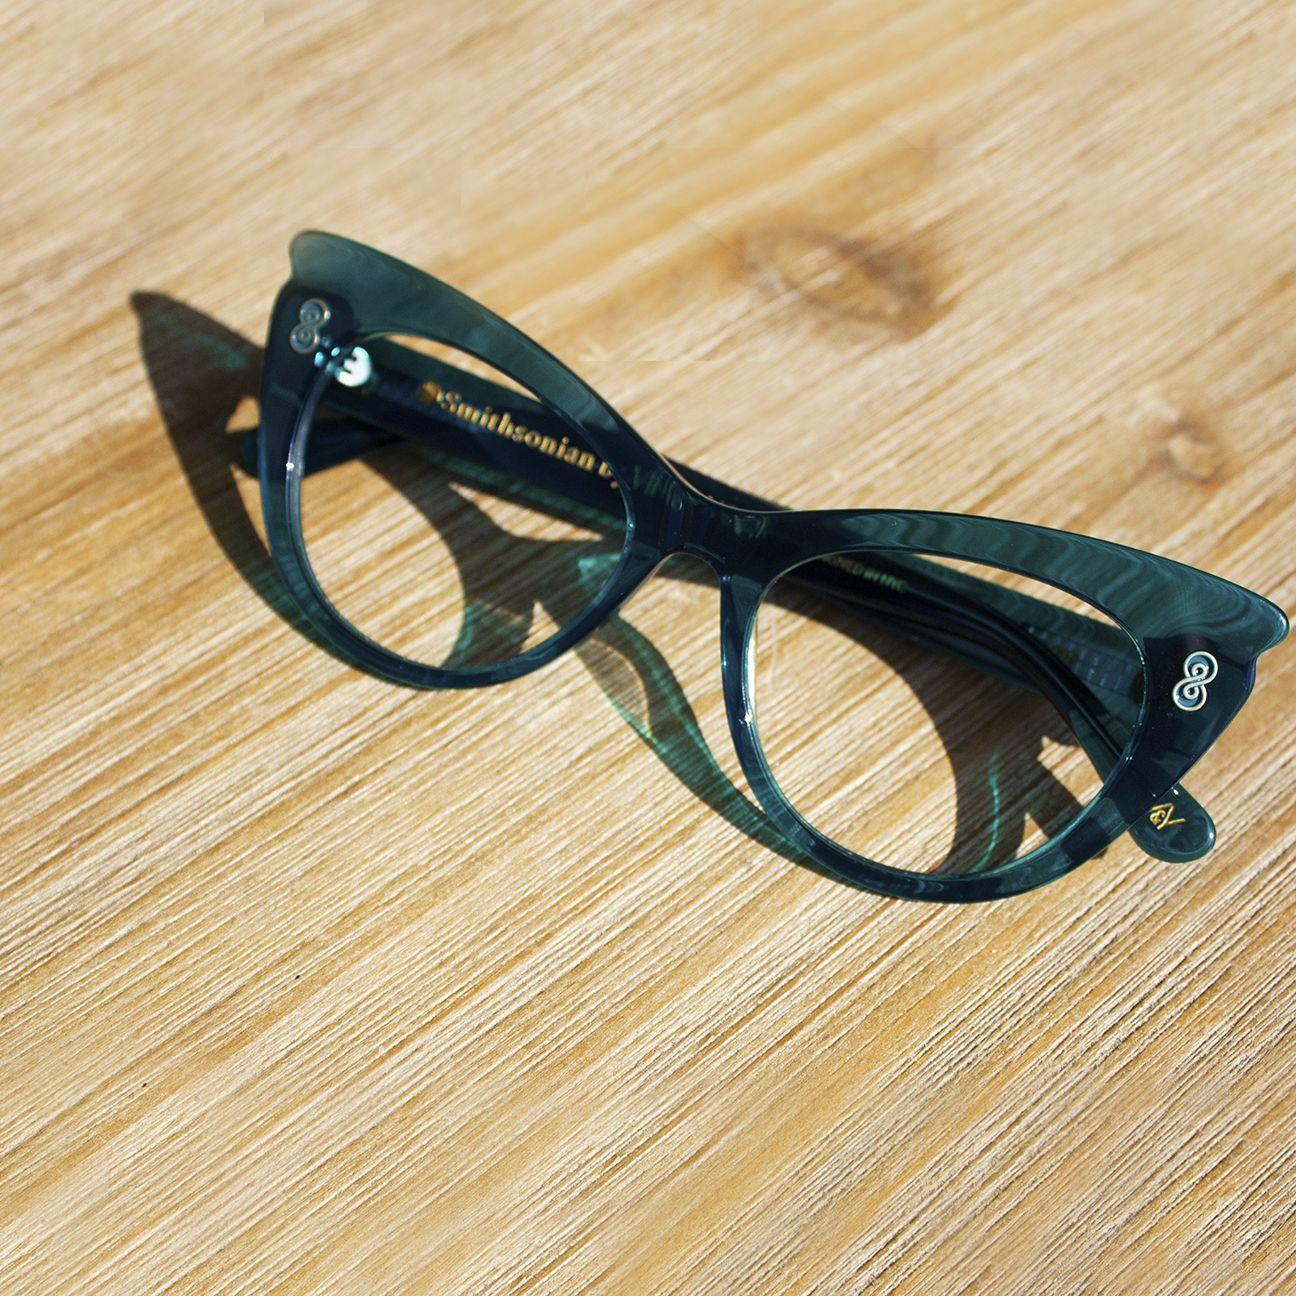 7cc6edb156bf High quality designer cat eye frames from Vint   York. One year warranty  included. Starting at  149.